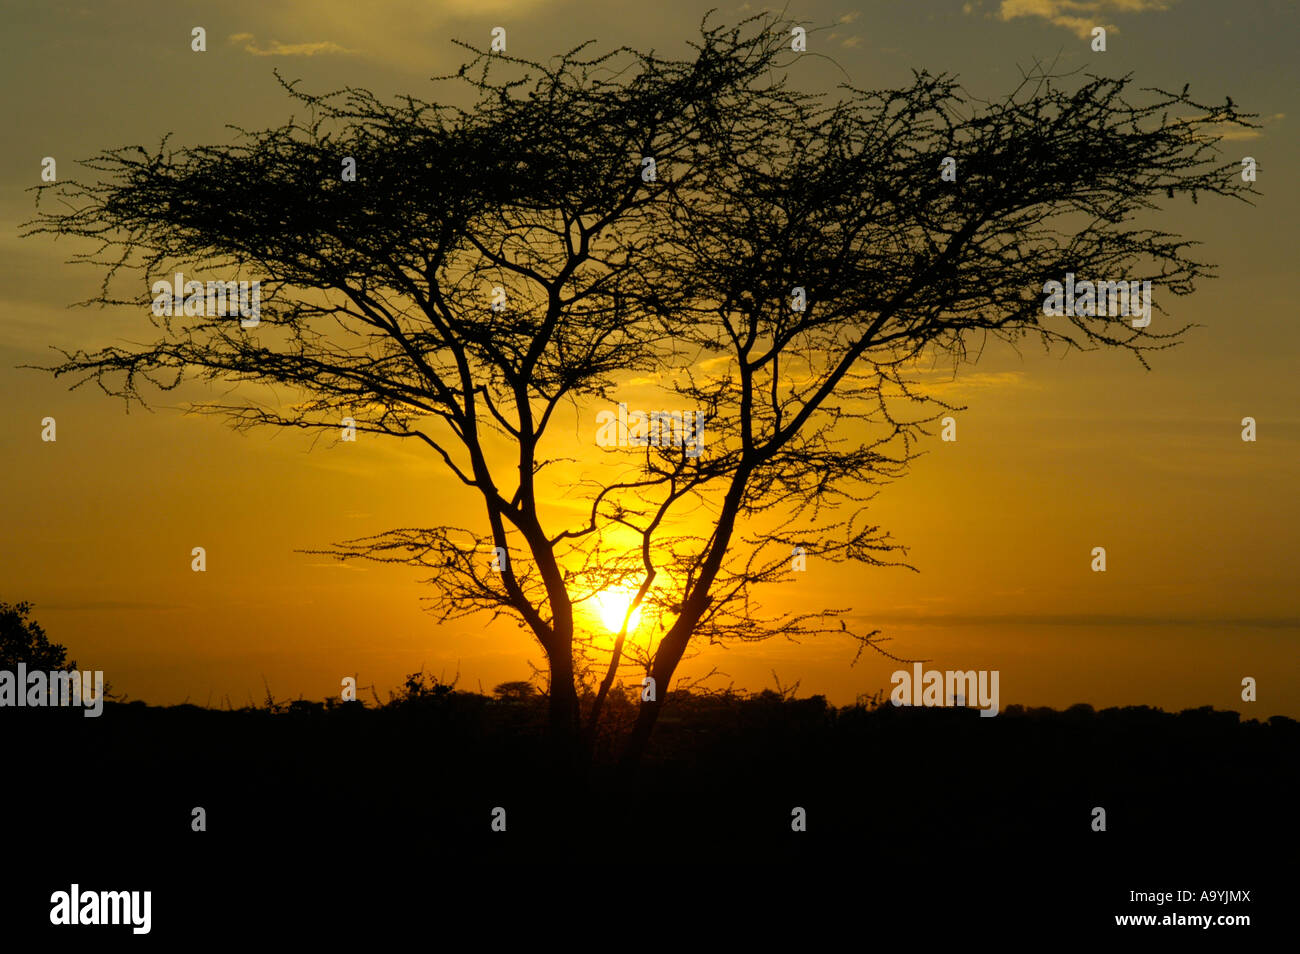 Orange sun and sky at sundown behind an acatia tree in the savannnah Turmi Ethiopia Stock Photo